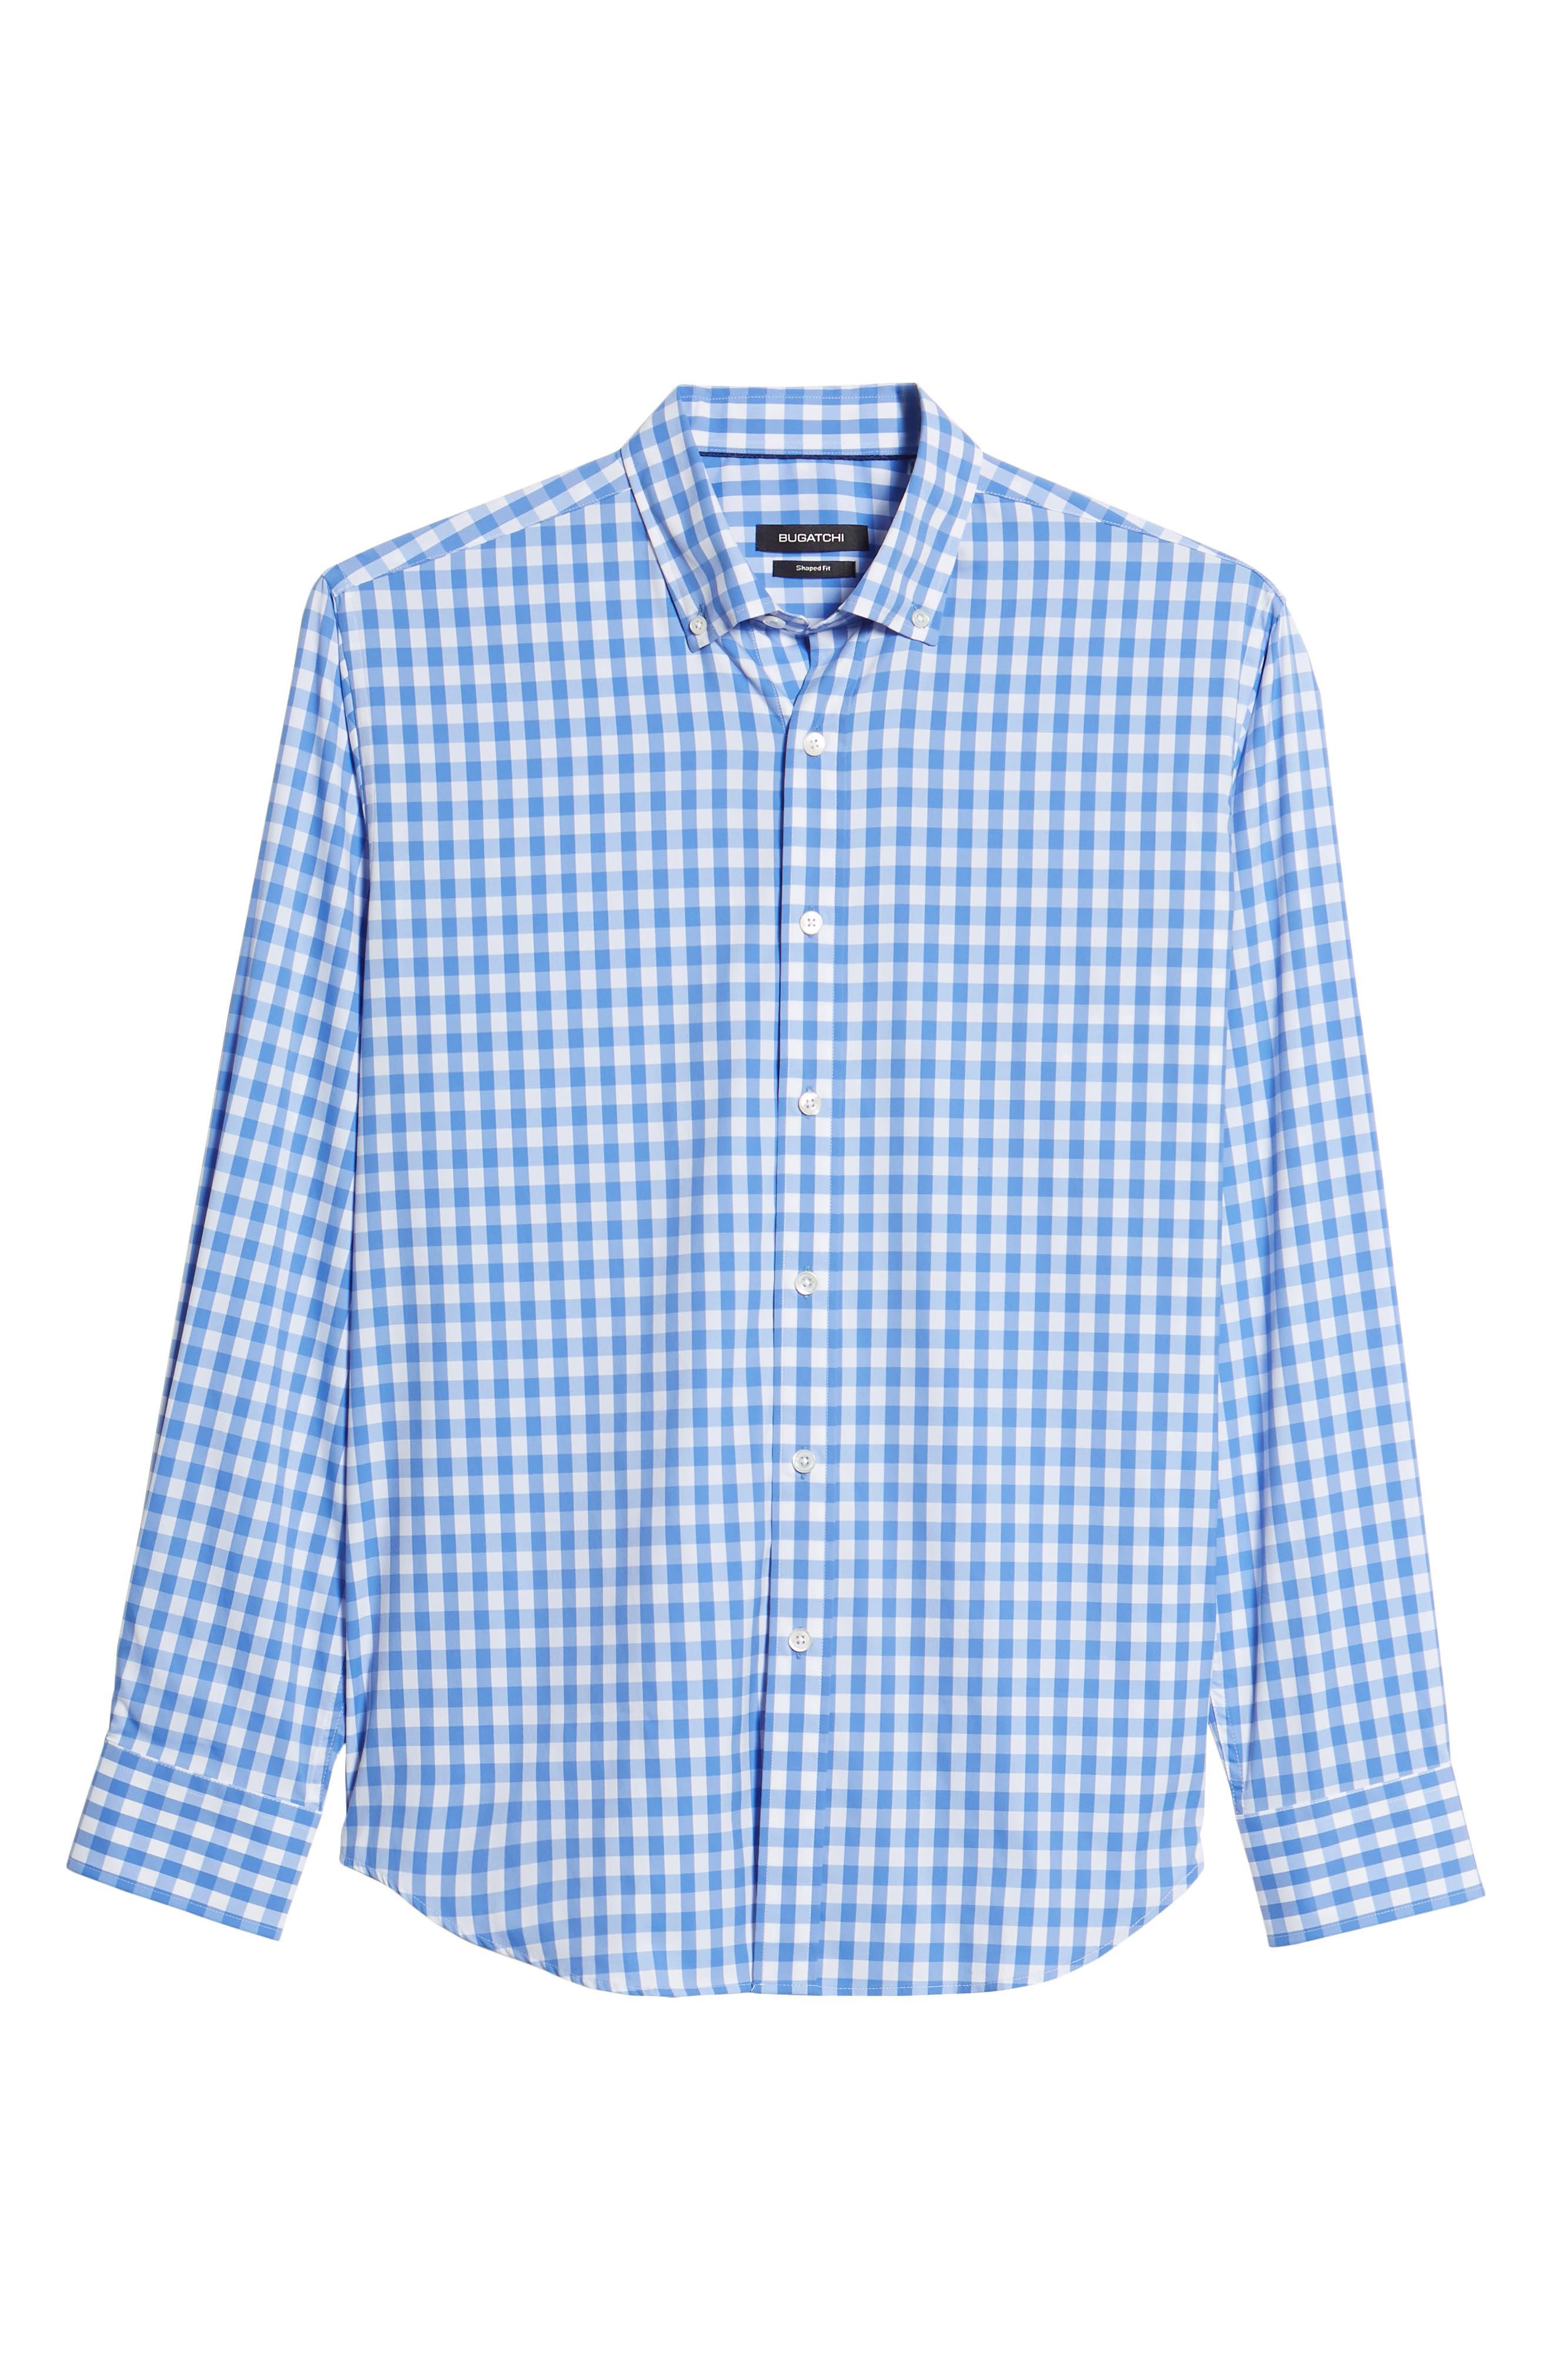 BUGATCHI,                             Shaped Fit Gingham Sport Shirt,                             Alternate thumbnail 6, color,                             422